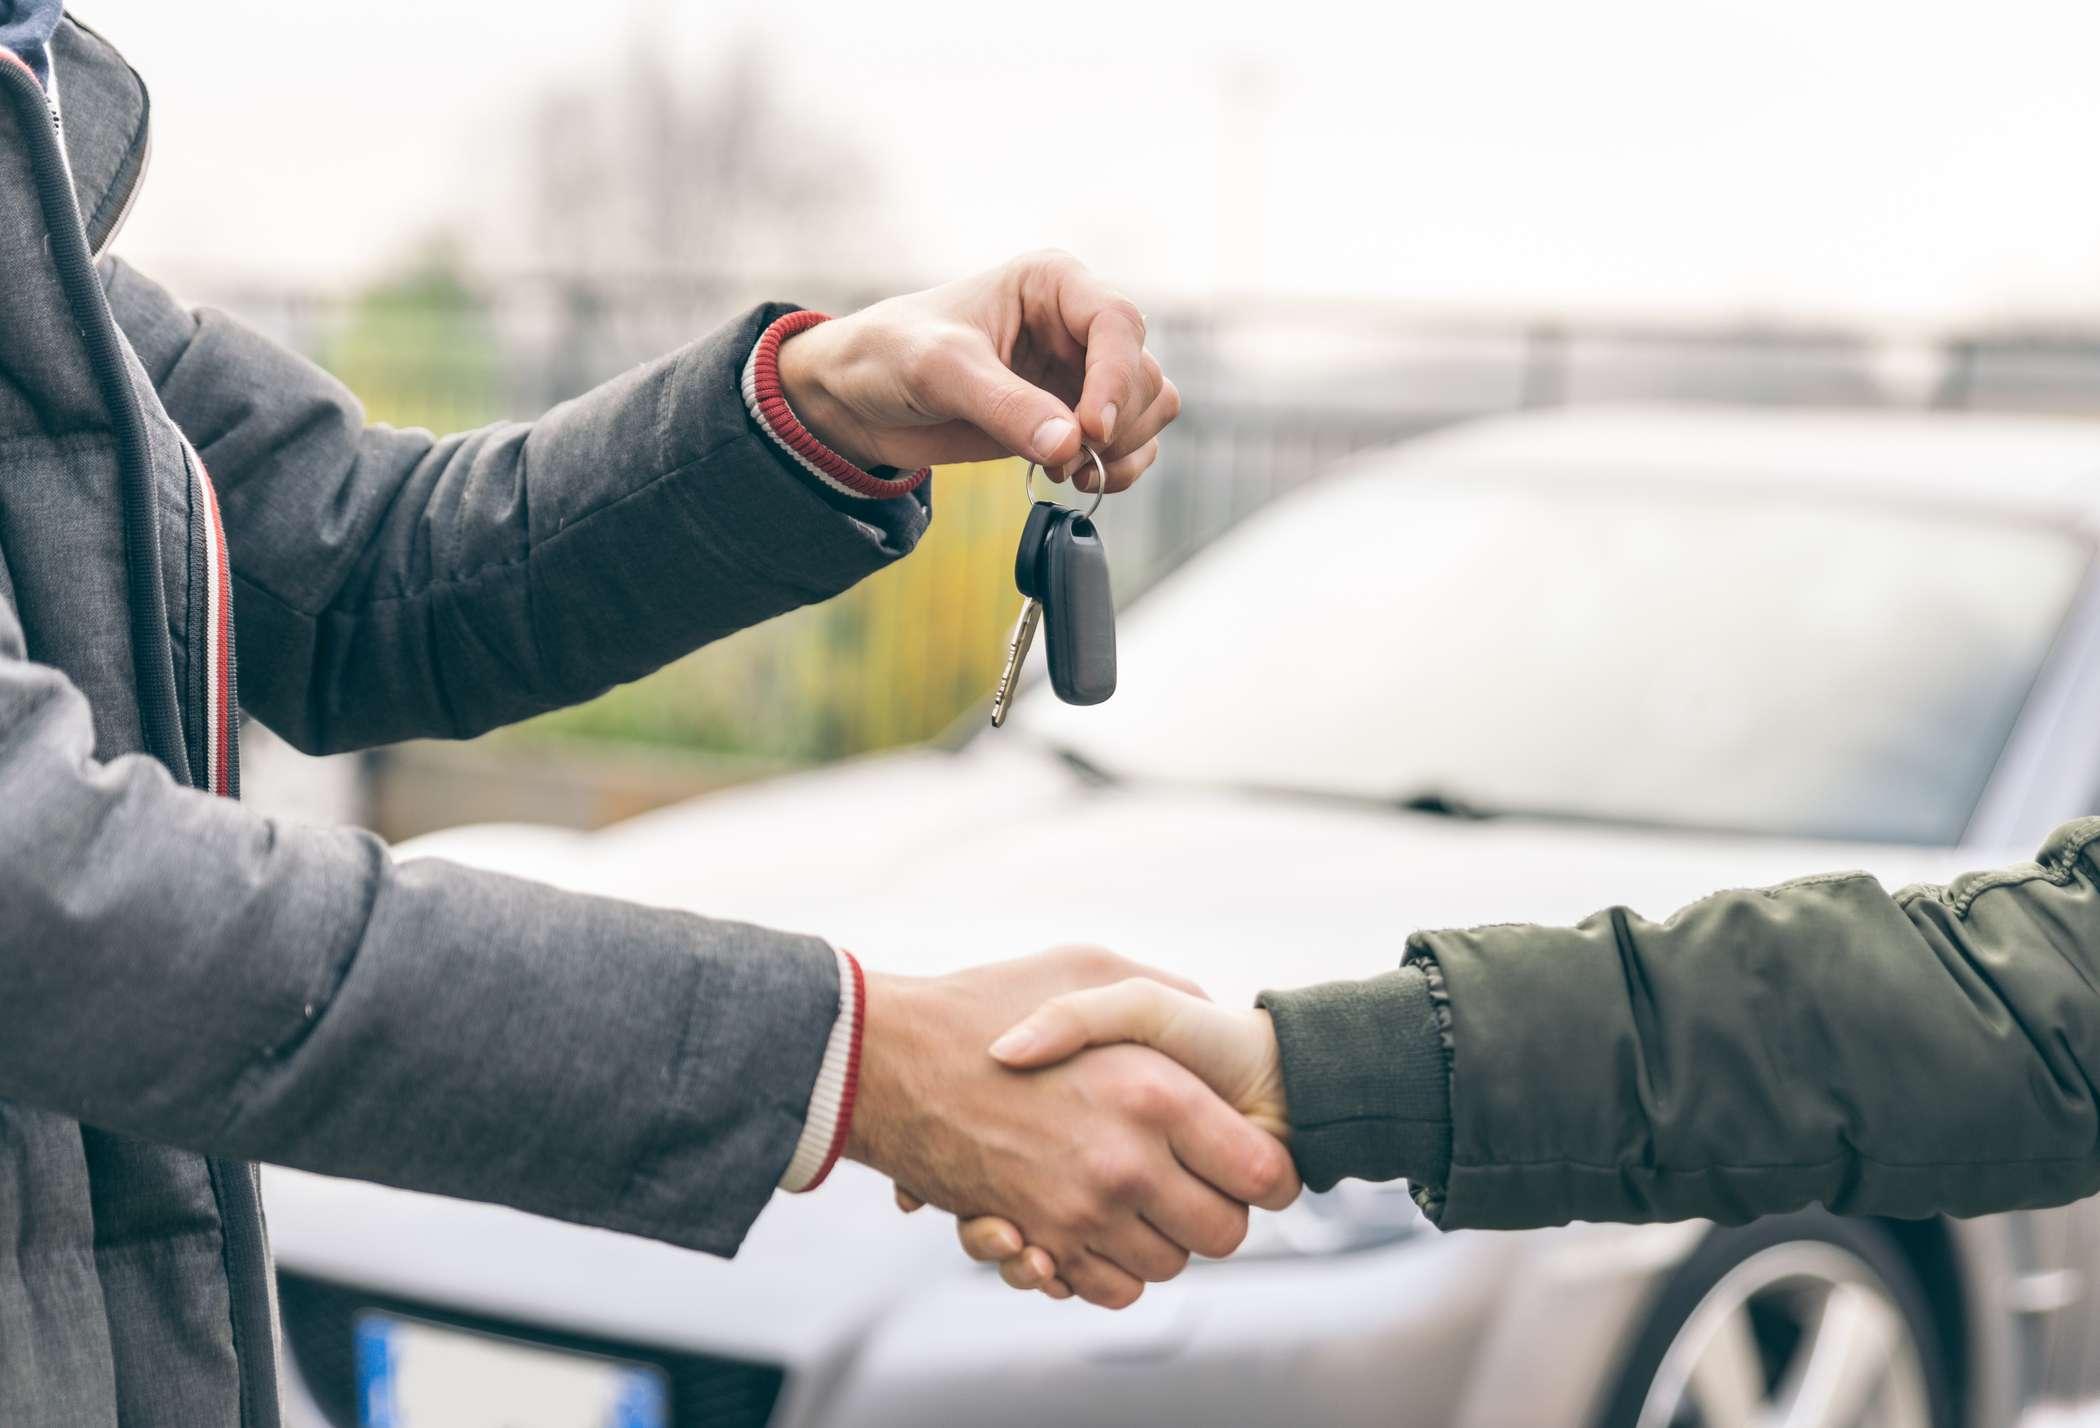 A man handing over his keys